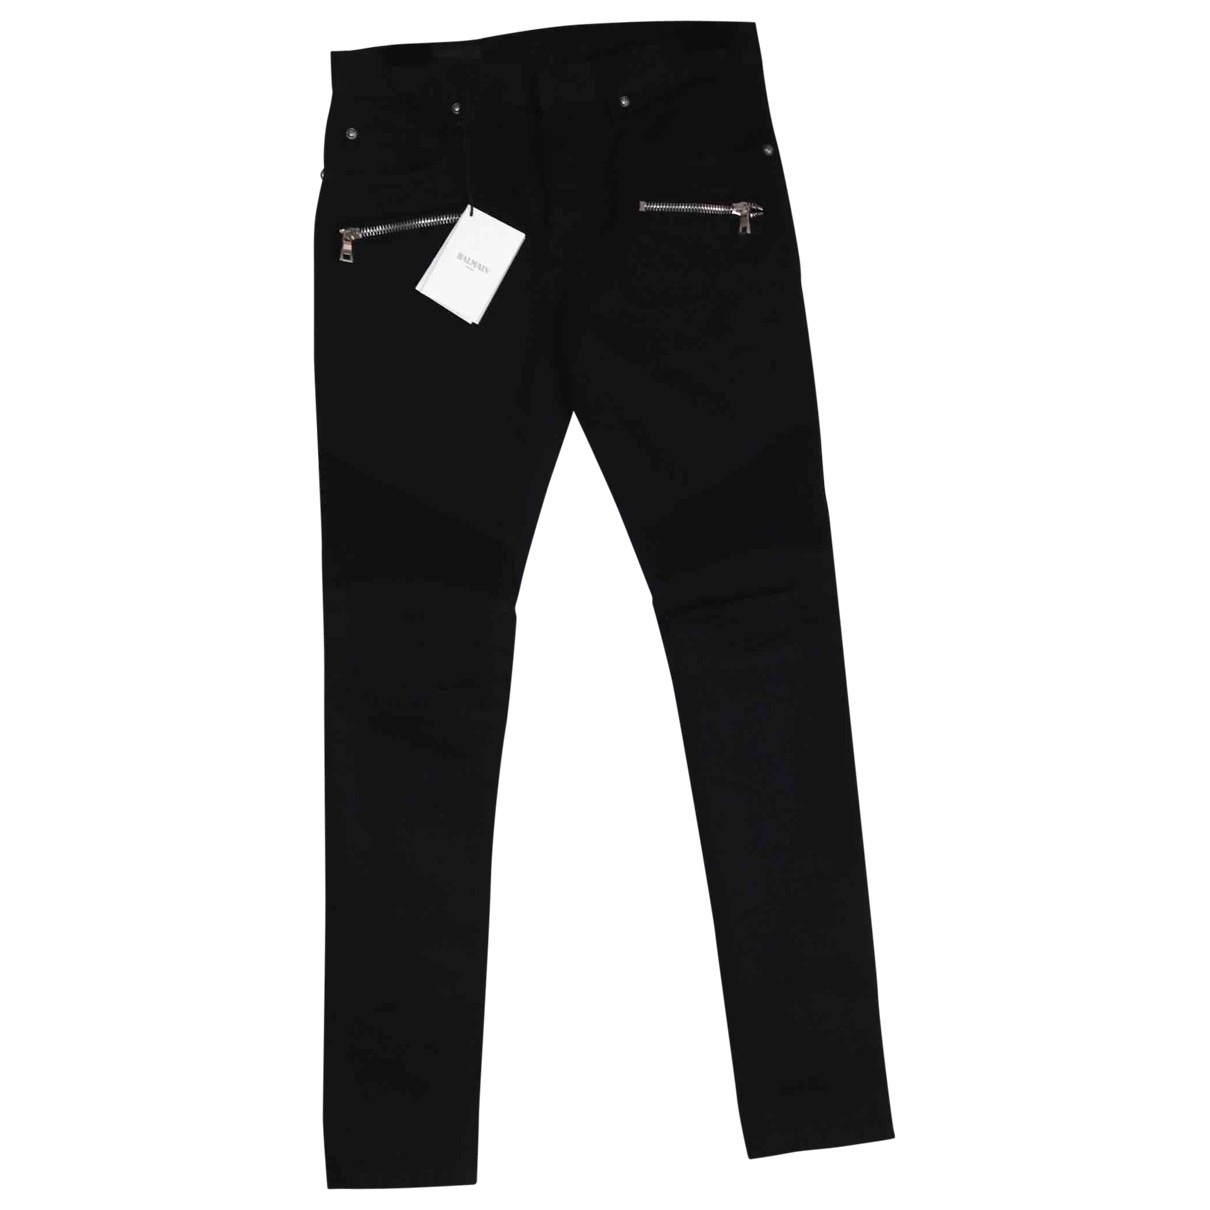 Balmain \N Black Cotton Trousers for Men 30 UK - US